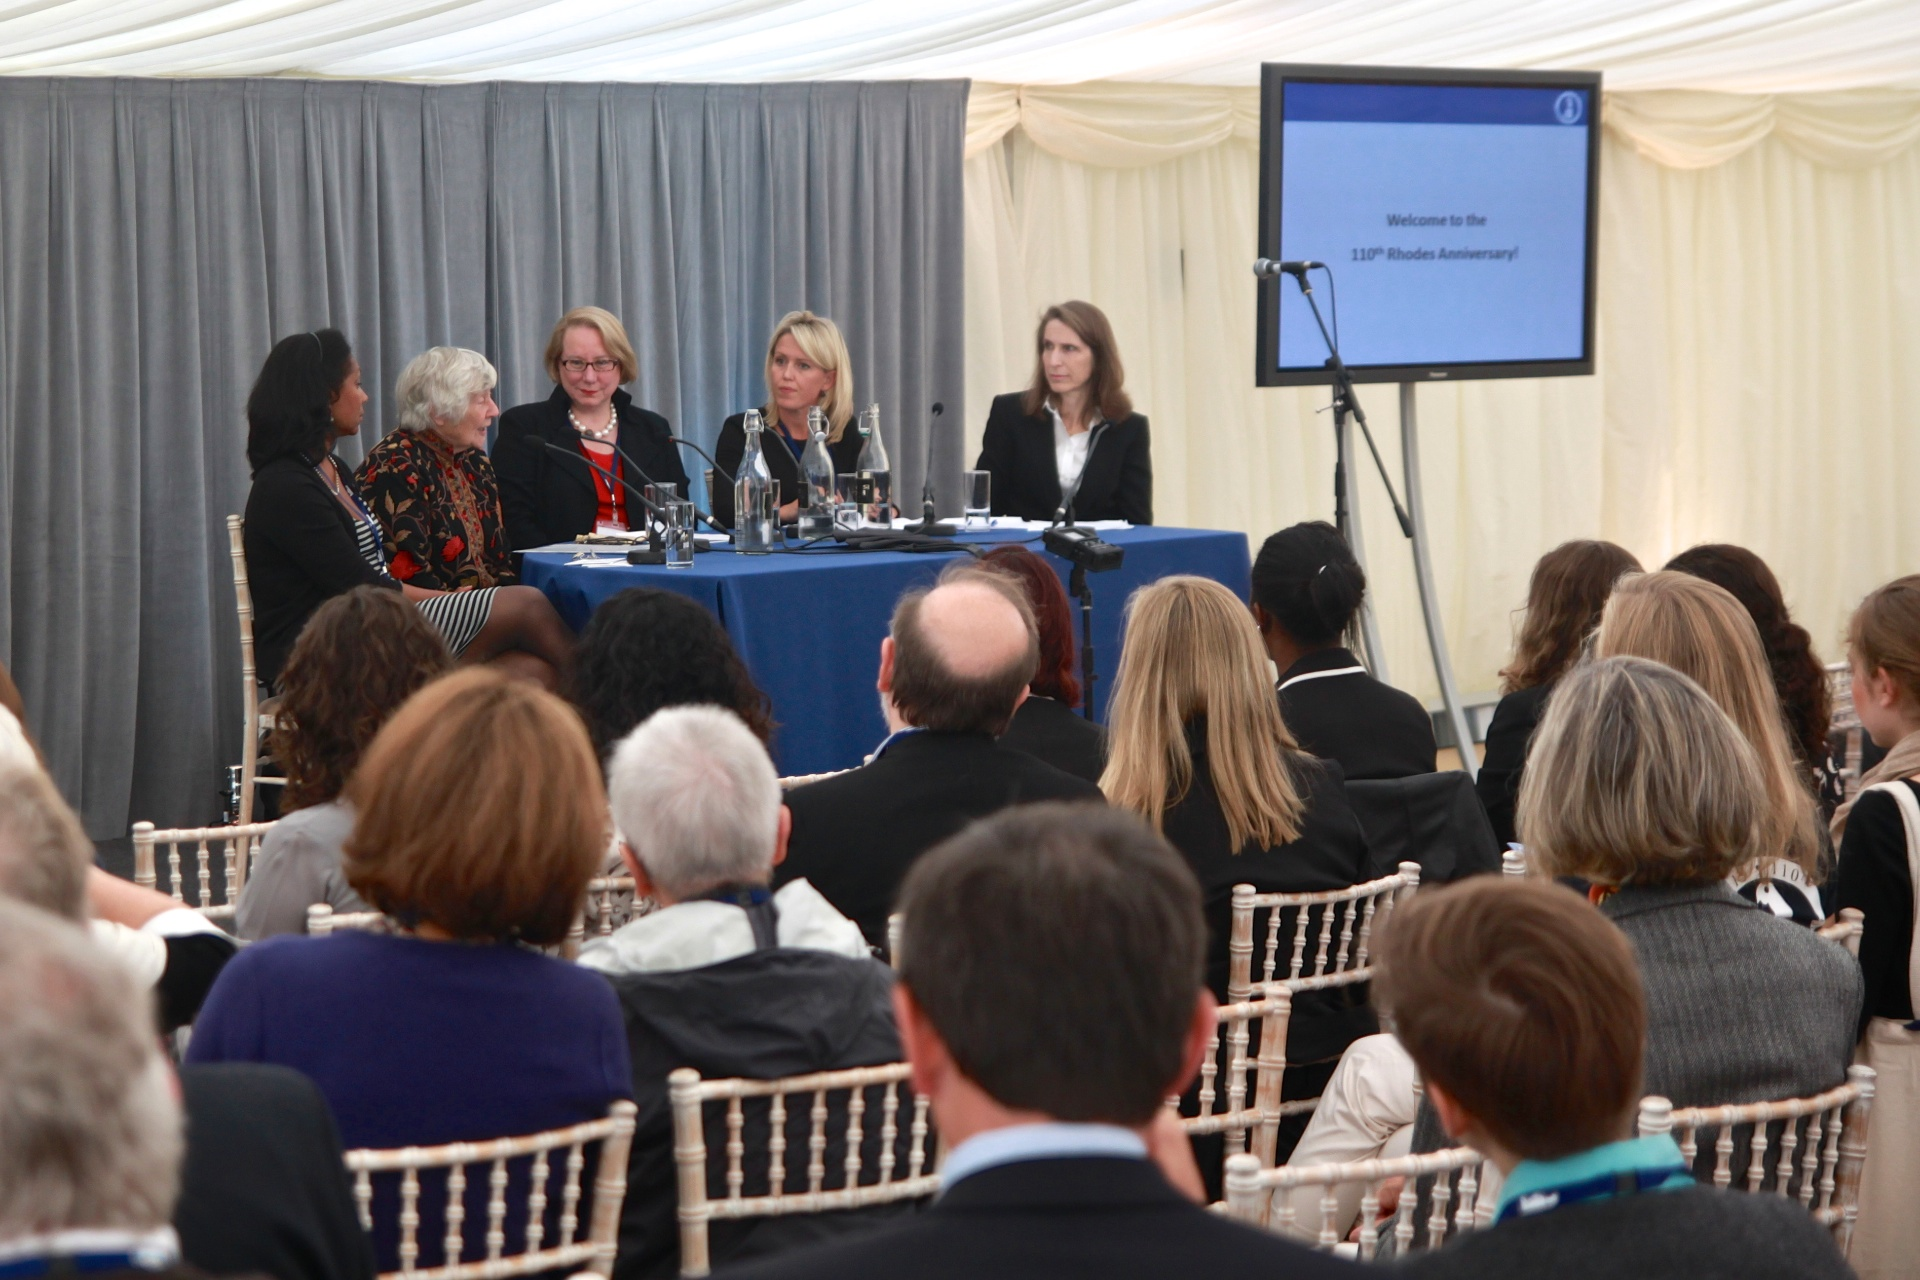 Panelists Karen Stevenson, Dame Shirley Williams, Ann Olivarius, Jennifer Robinson, Michele Warman. Photographed by Honza Cervenka.